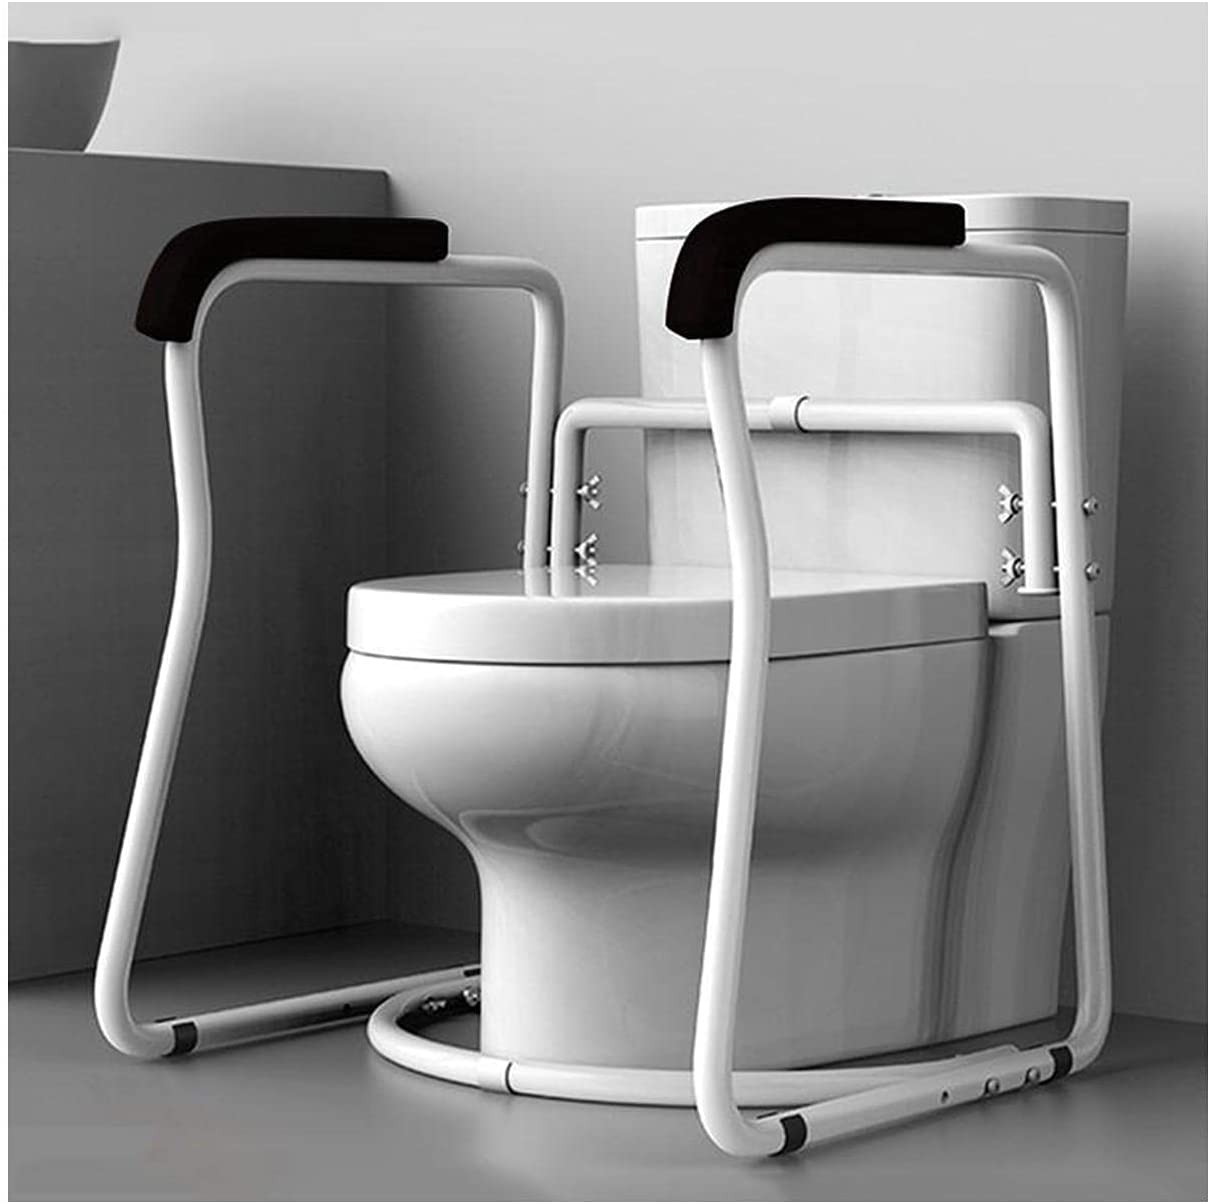 Toilet Stand Standing Aids Over item handling ☆ Support Ant Safety Regular dealer